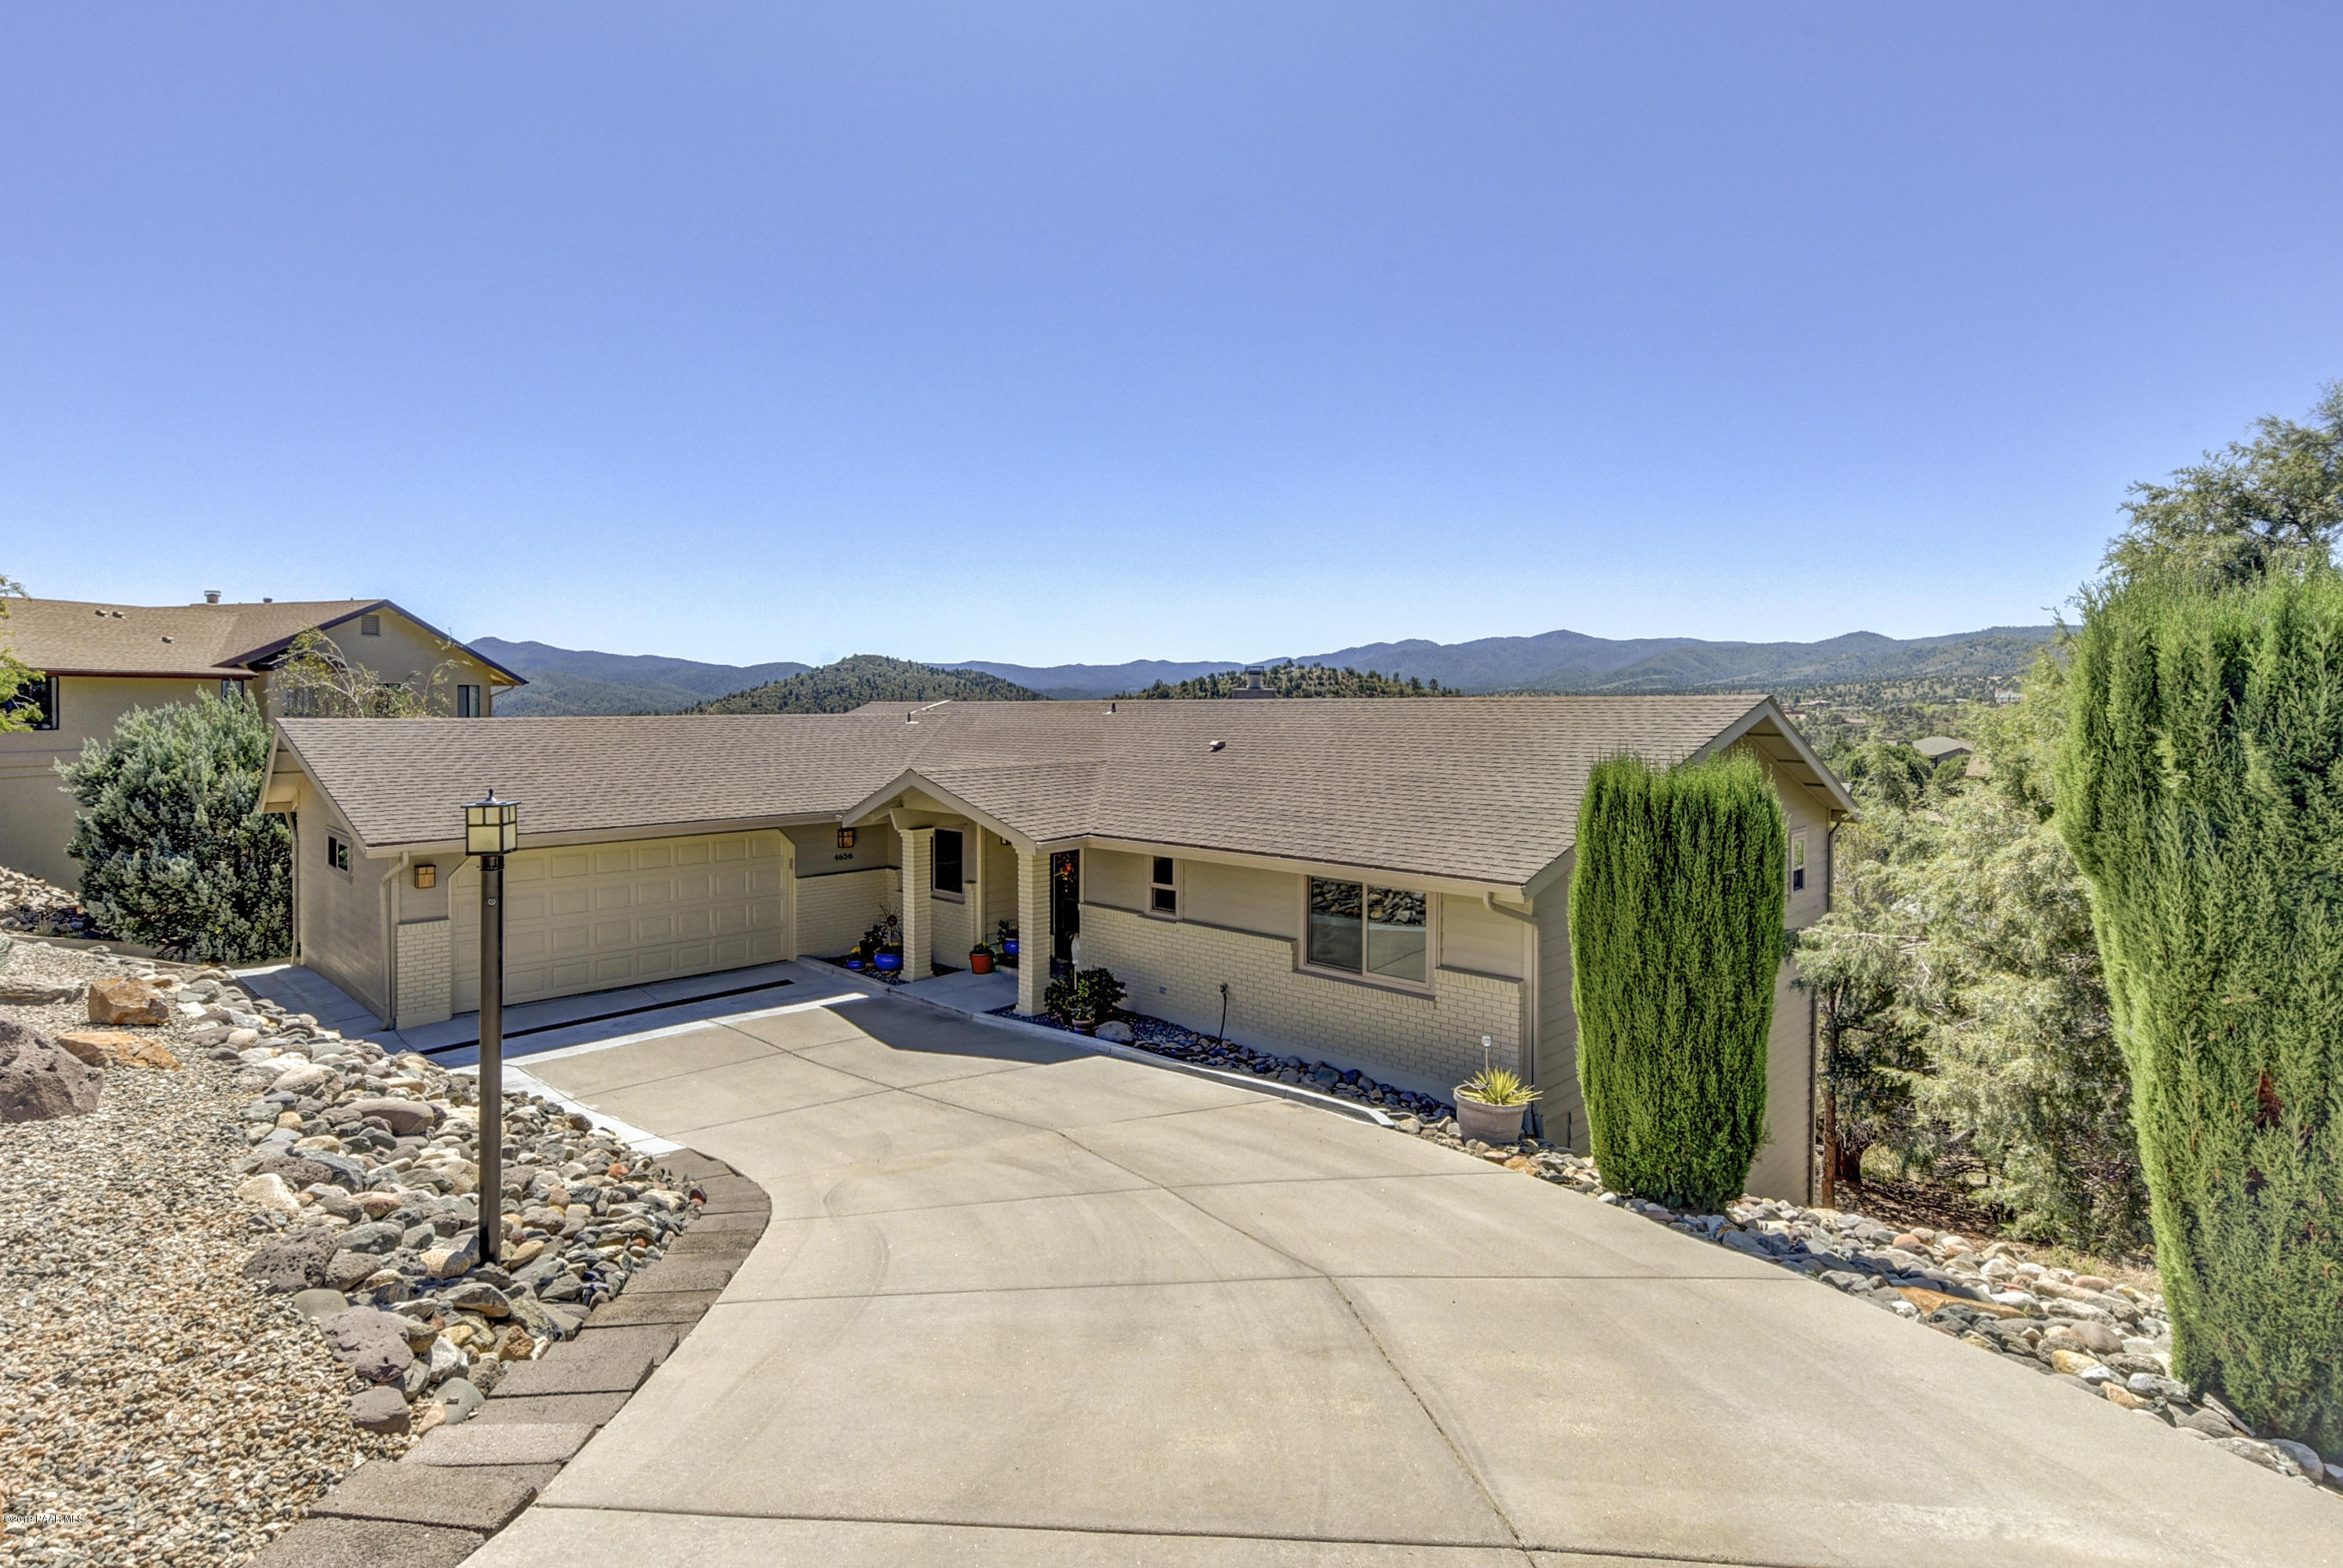 Photo of 4656 Hornet, Prescott, AZ 86301